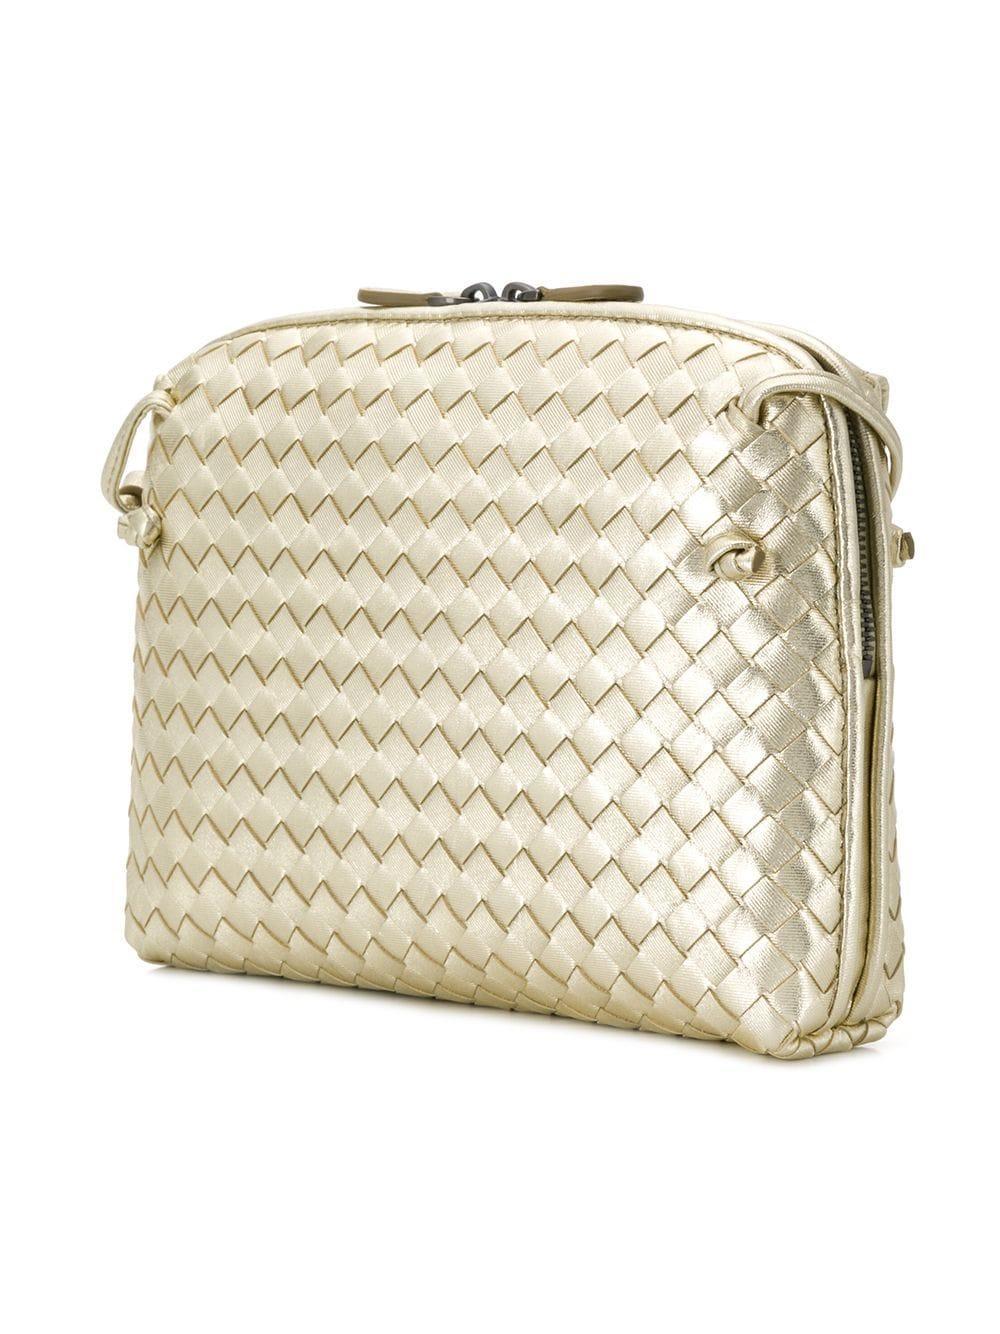 Bottega Veneta - Metallic Intrecciato Grosgrain Crossbody Bag - Lyst. View  fullscreen 6c032c34cd05a